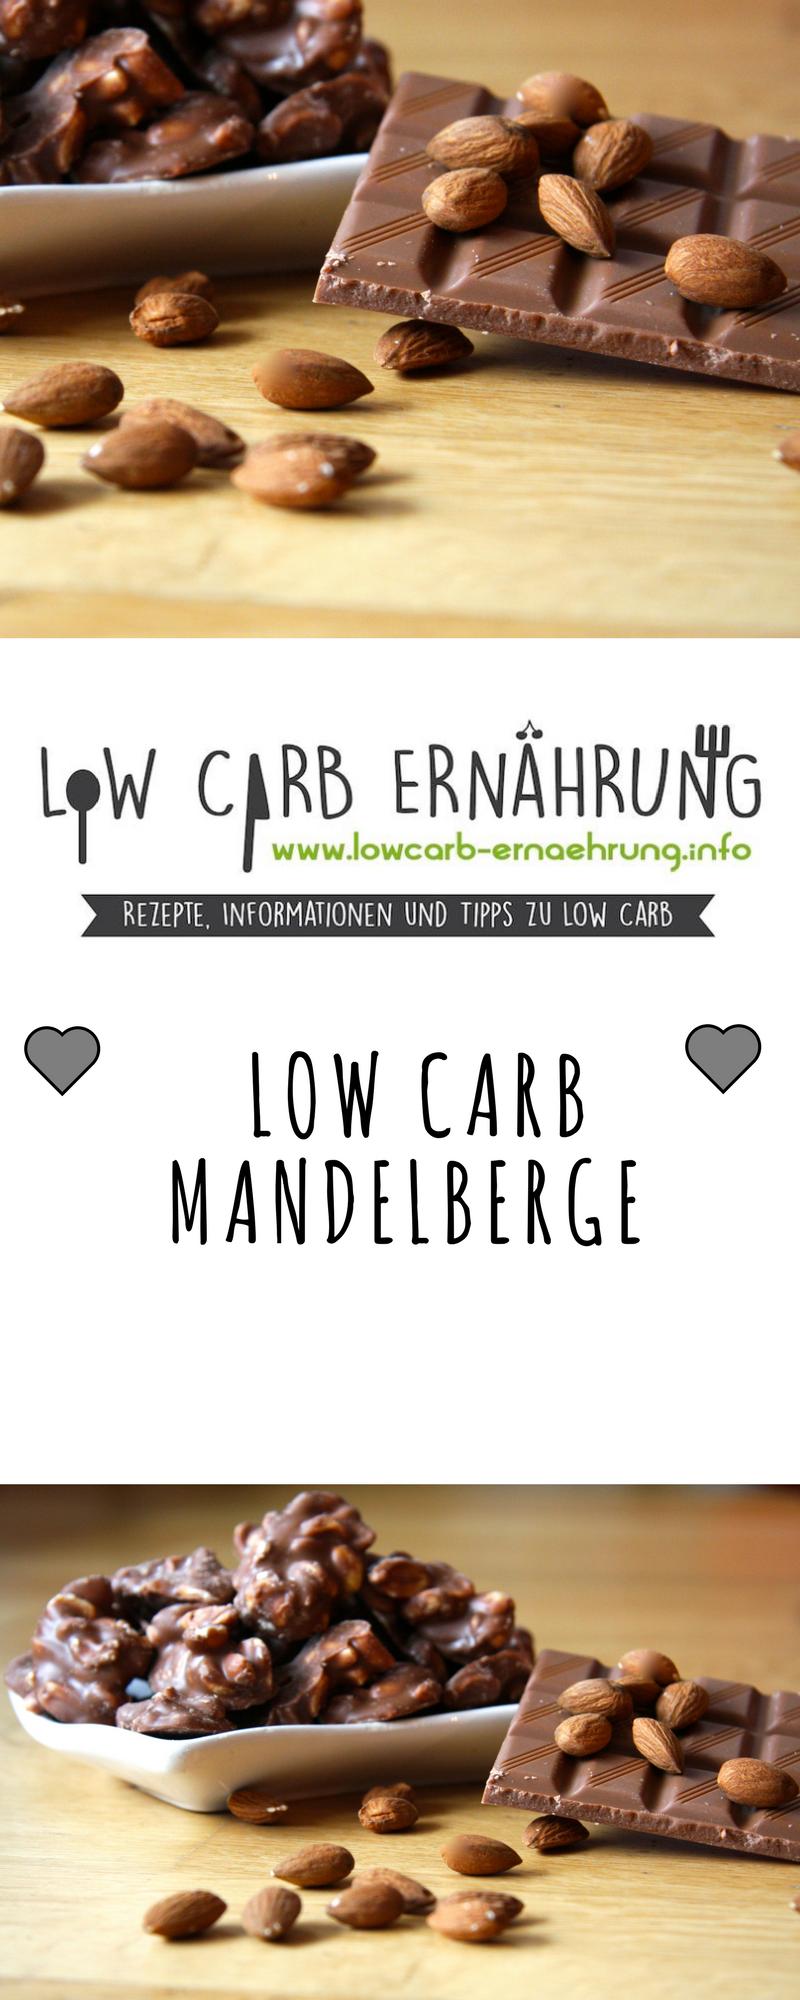 low carb rezept f r leckere mandelberge mit wenig kohlenhydraten und ohne low carb muffins. Black Bedroom Furniture Sets. Home Design Ideas